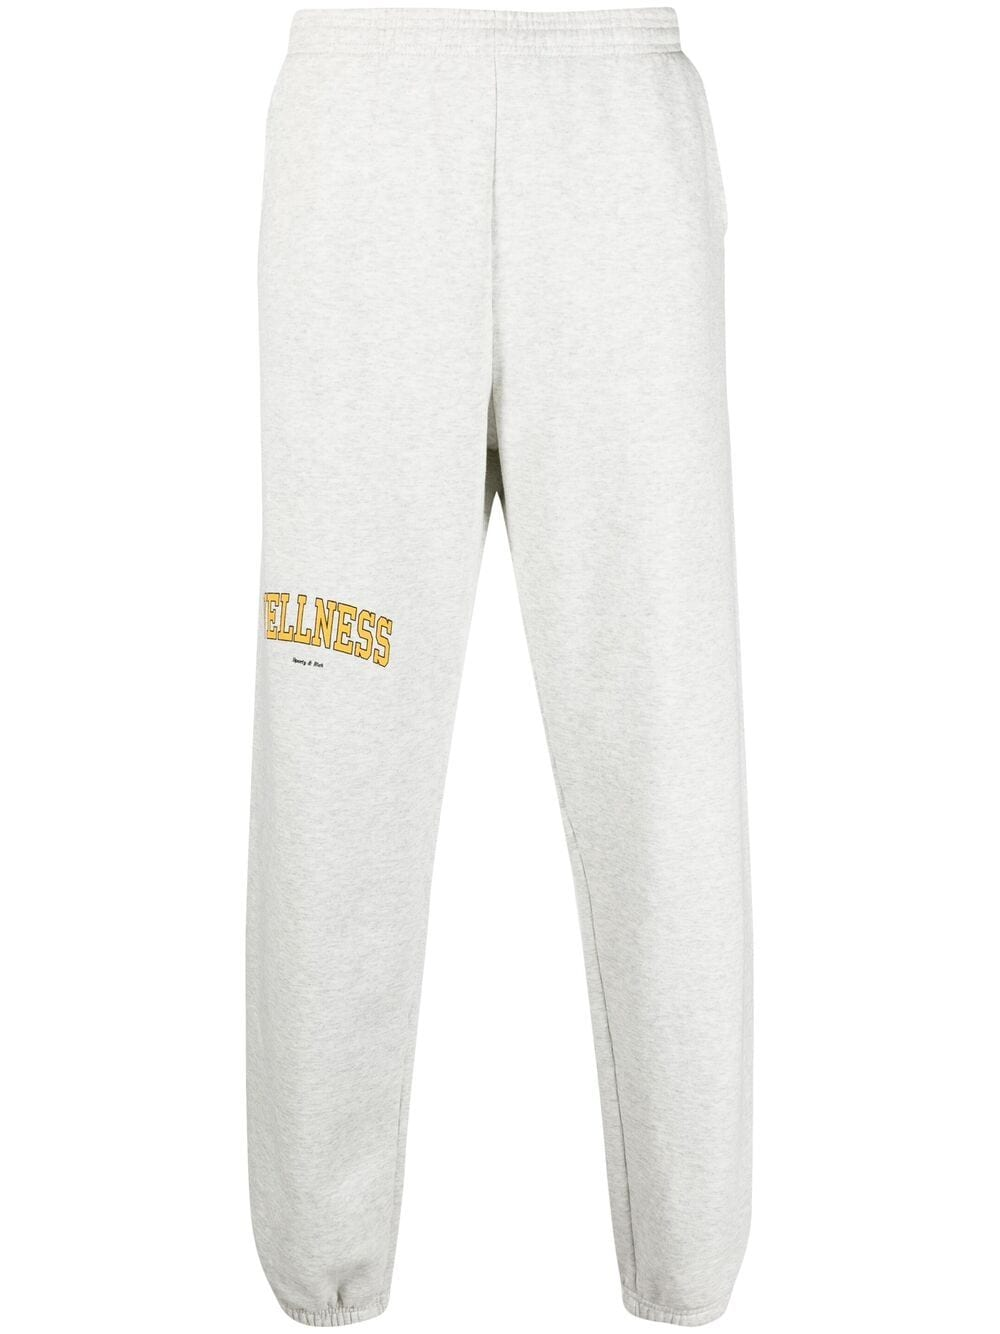 Sporty & Rich wellness trousers unisex grey SPORTY & RICH | Trousers | SW141HG